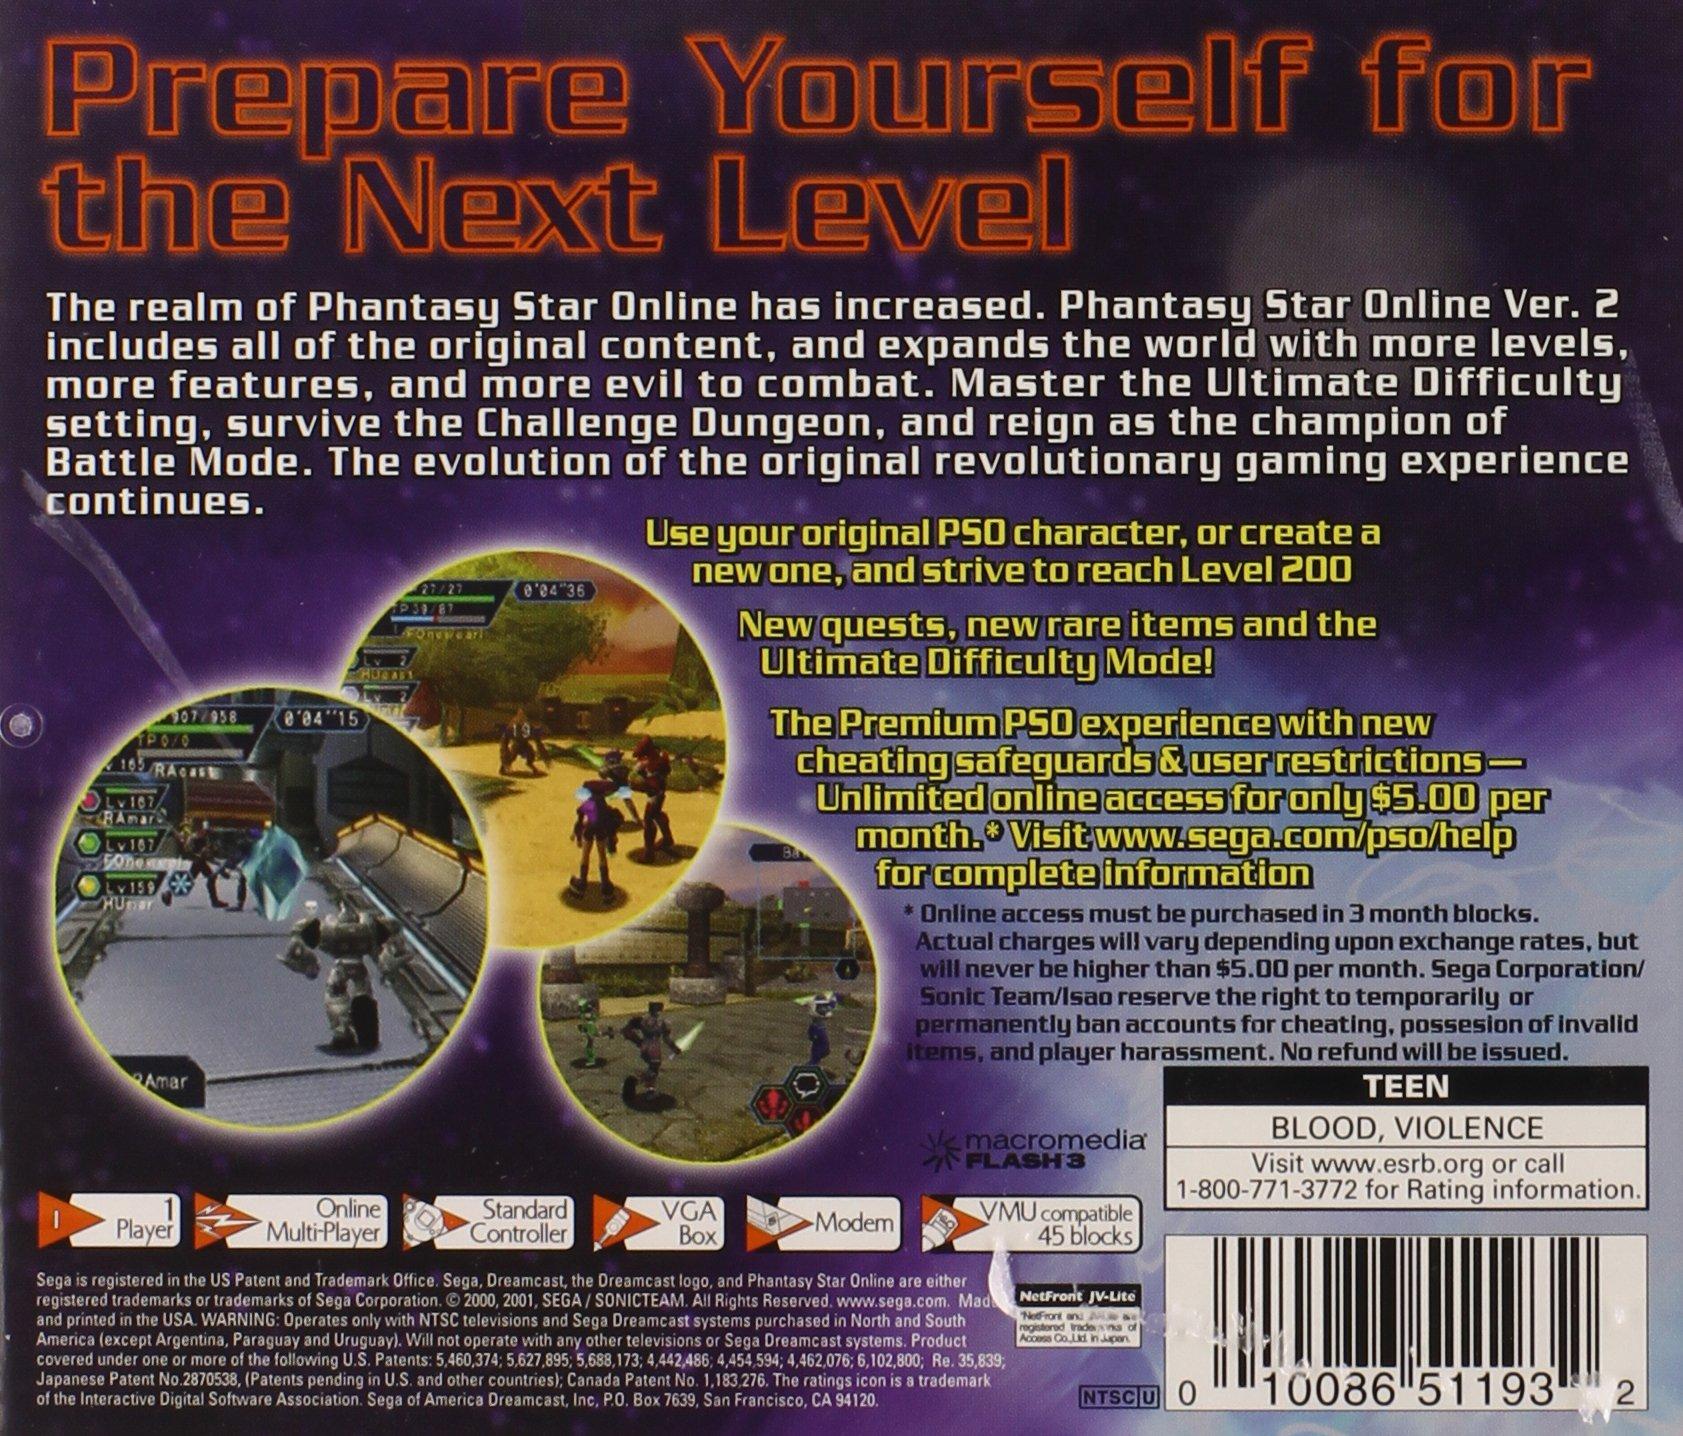 Phantasy Star Online Version 2 - Sega Dreamcast by Sega (Image #2)